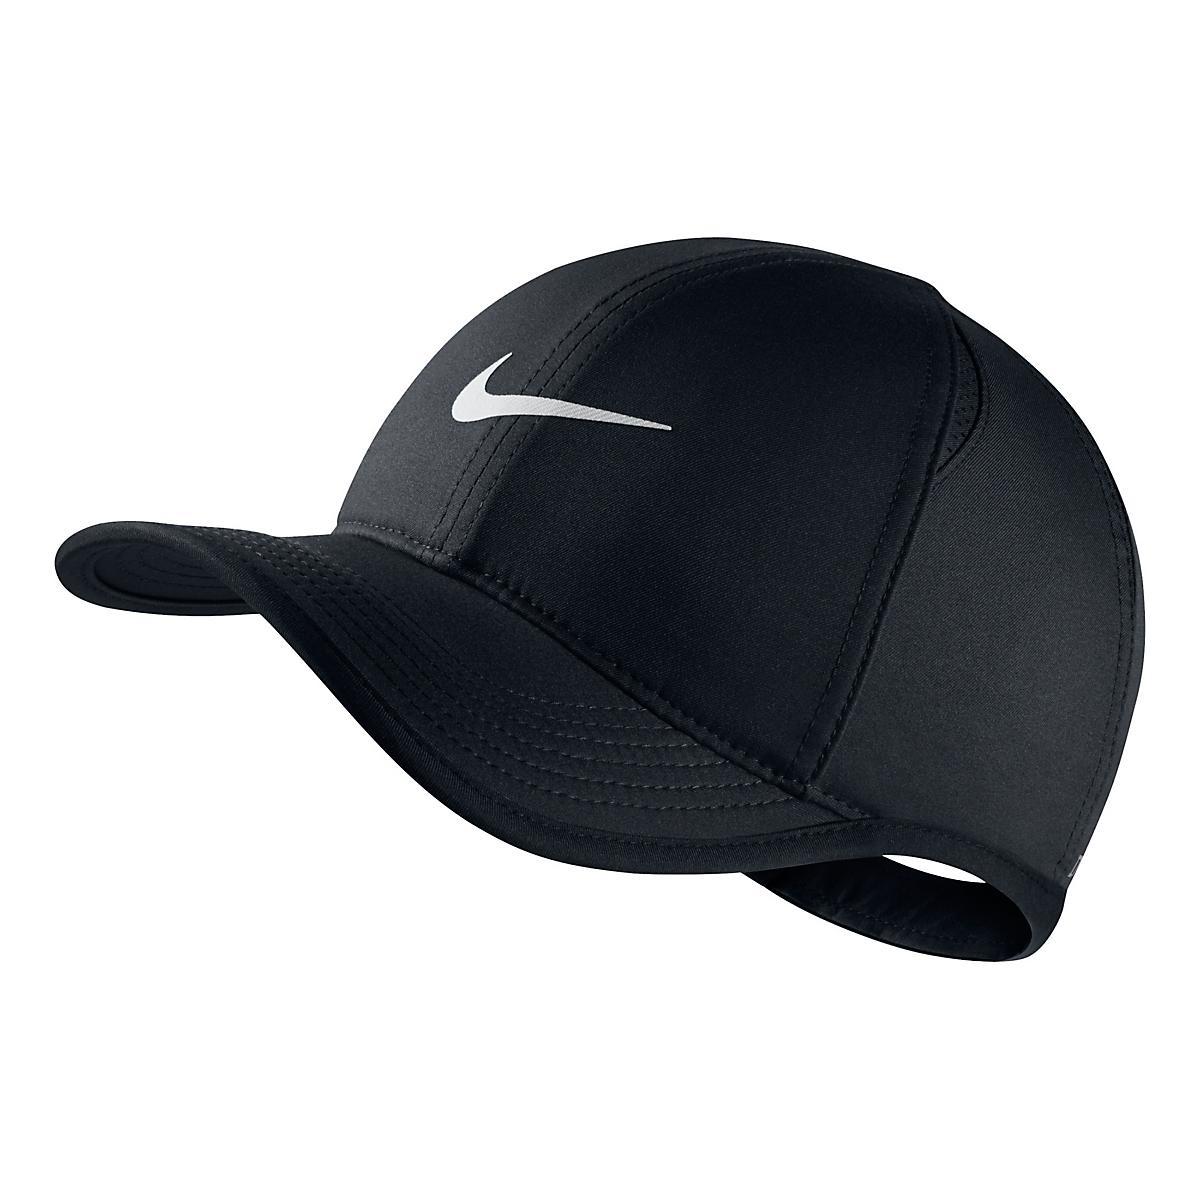 f253933782764 Nike Kids Featherlight Adjustable Hat Headwear